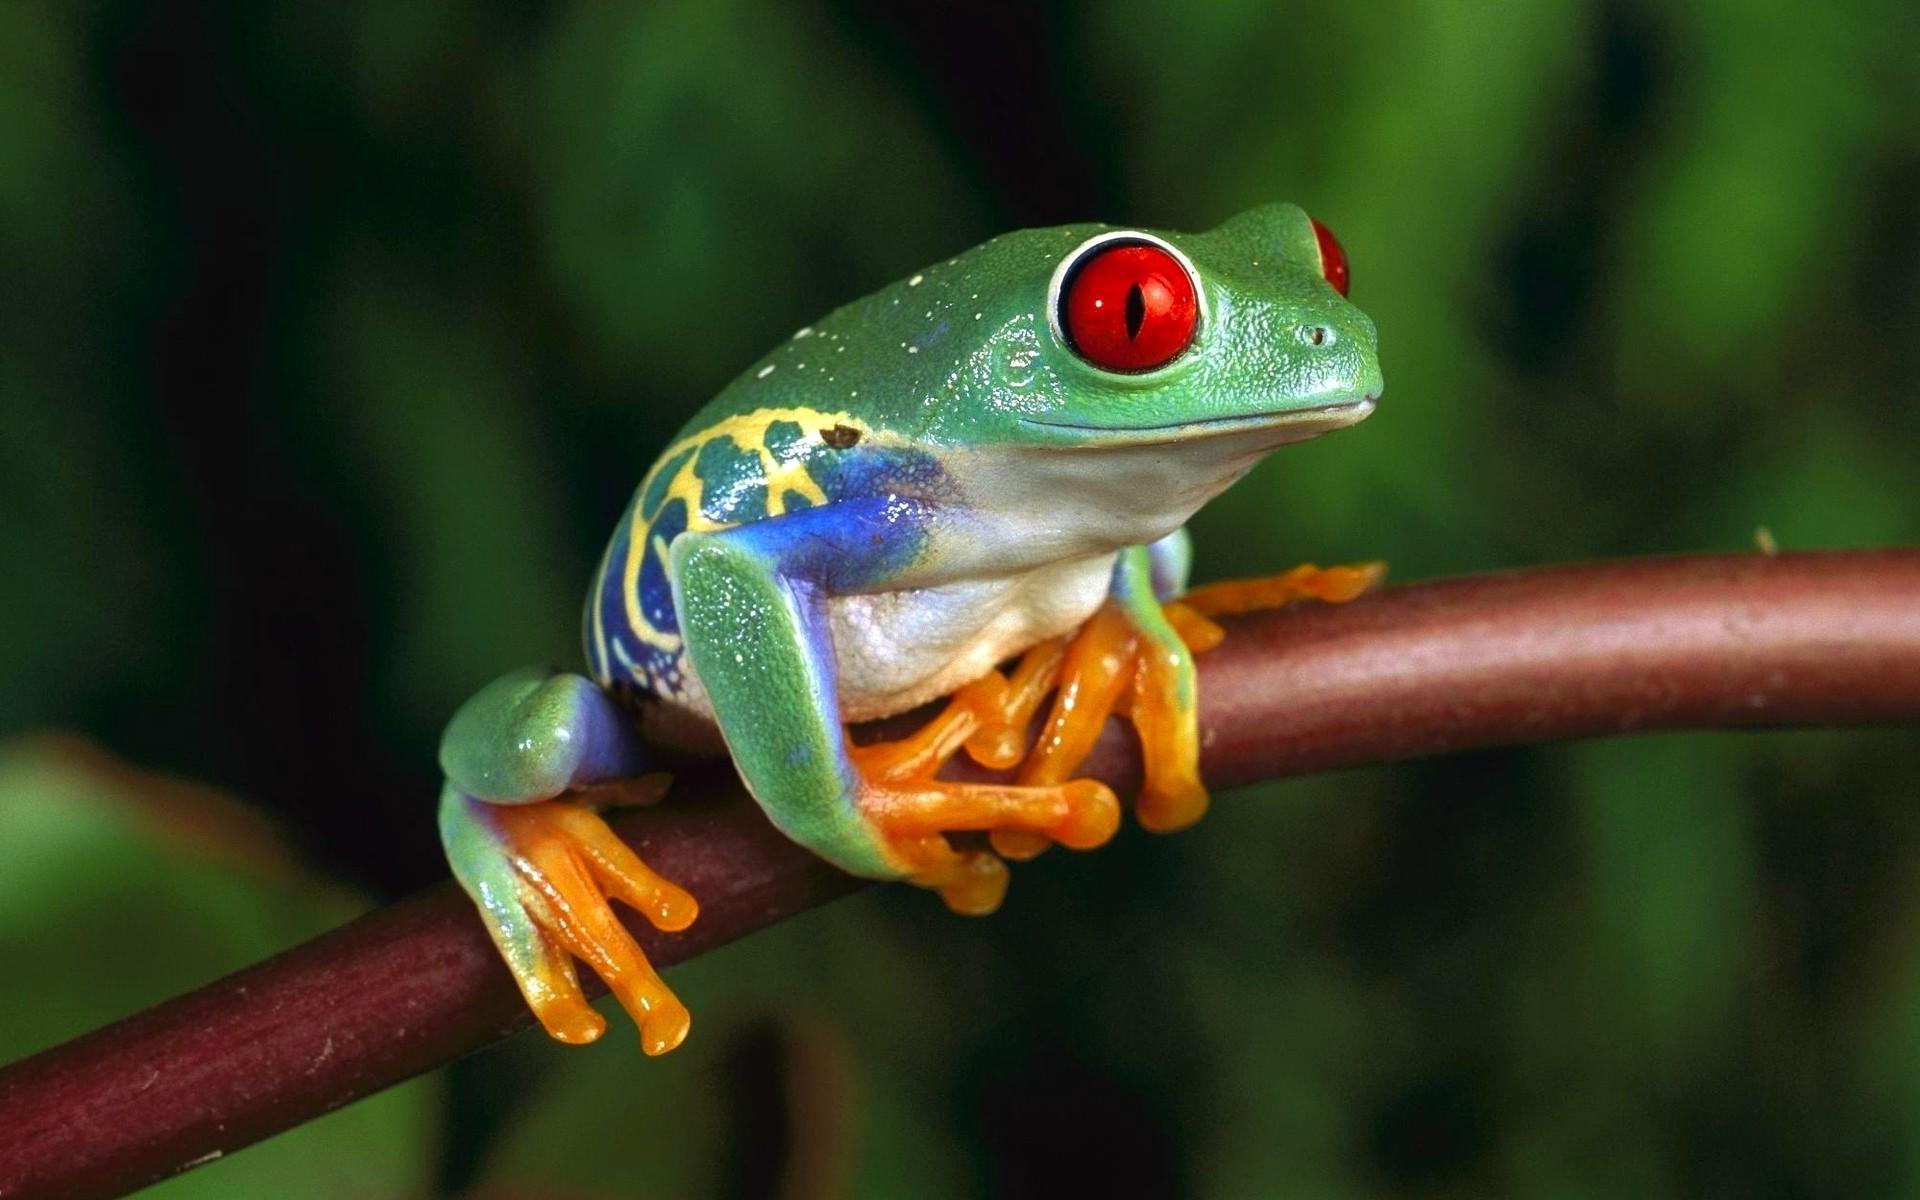 Cute Guitar Wallpaper For Mobile Funny Frog Wallpaper 183 ①